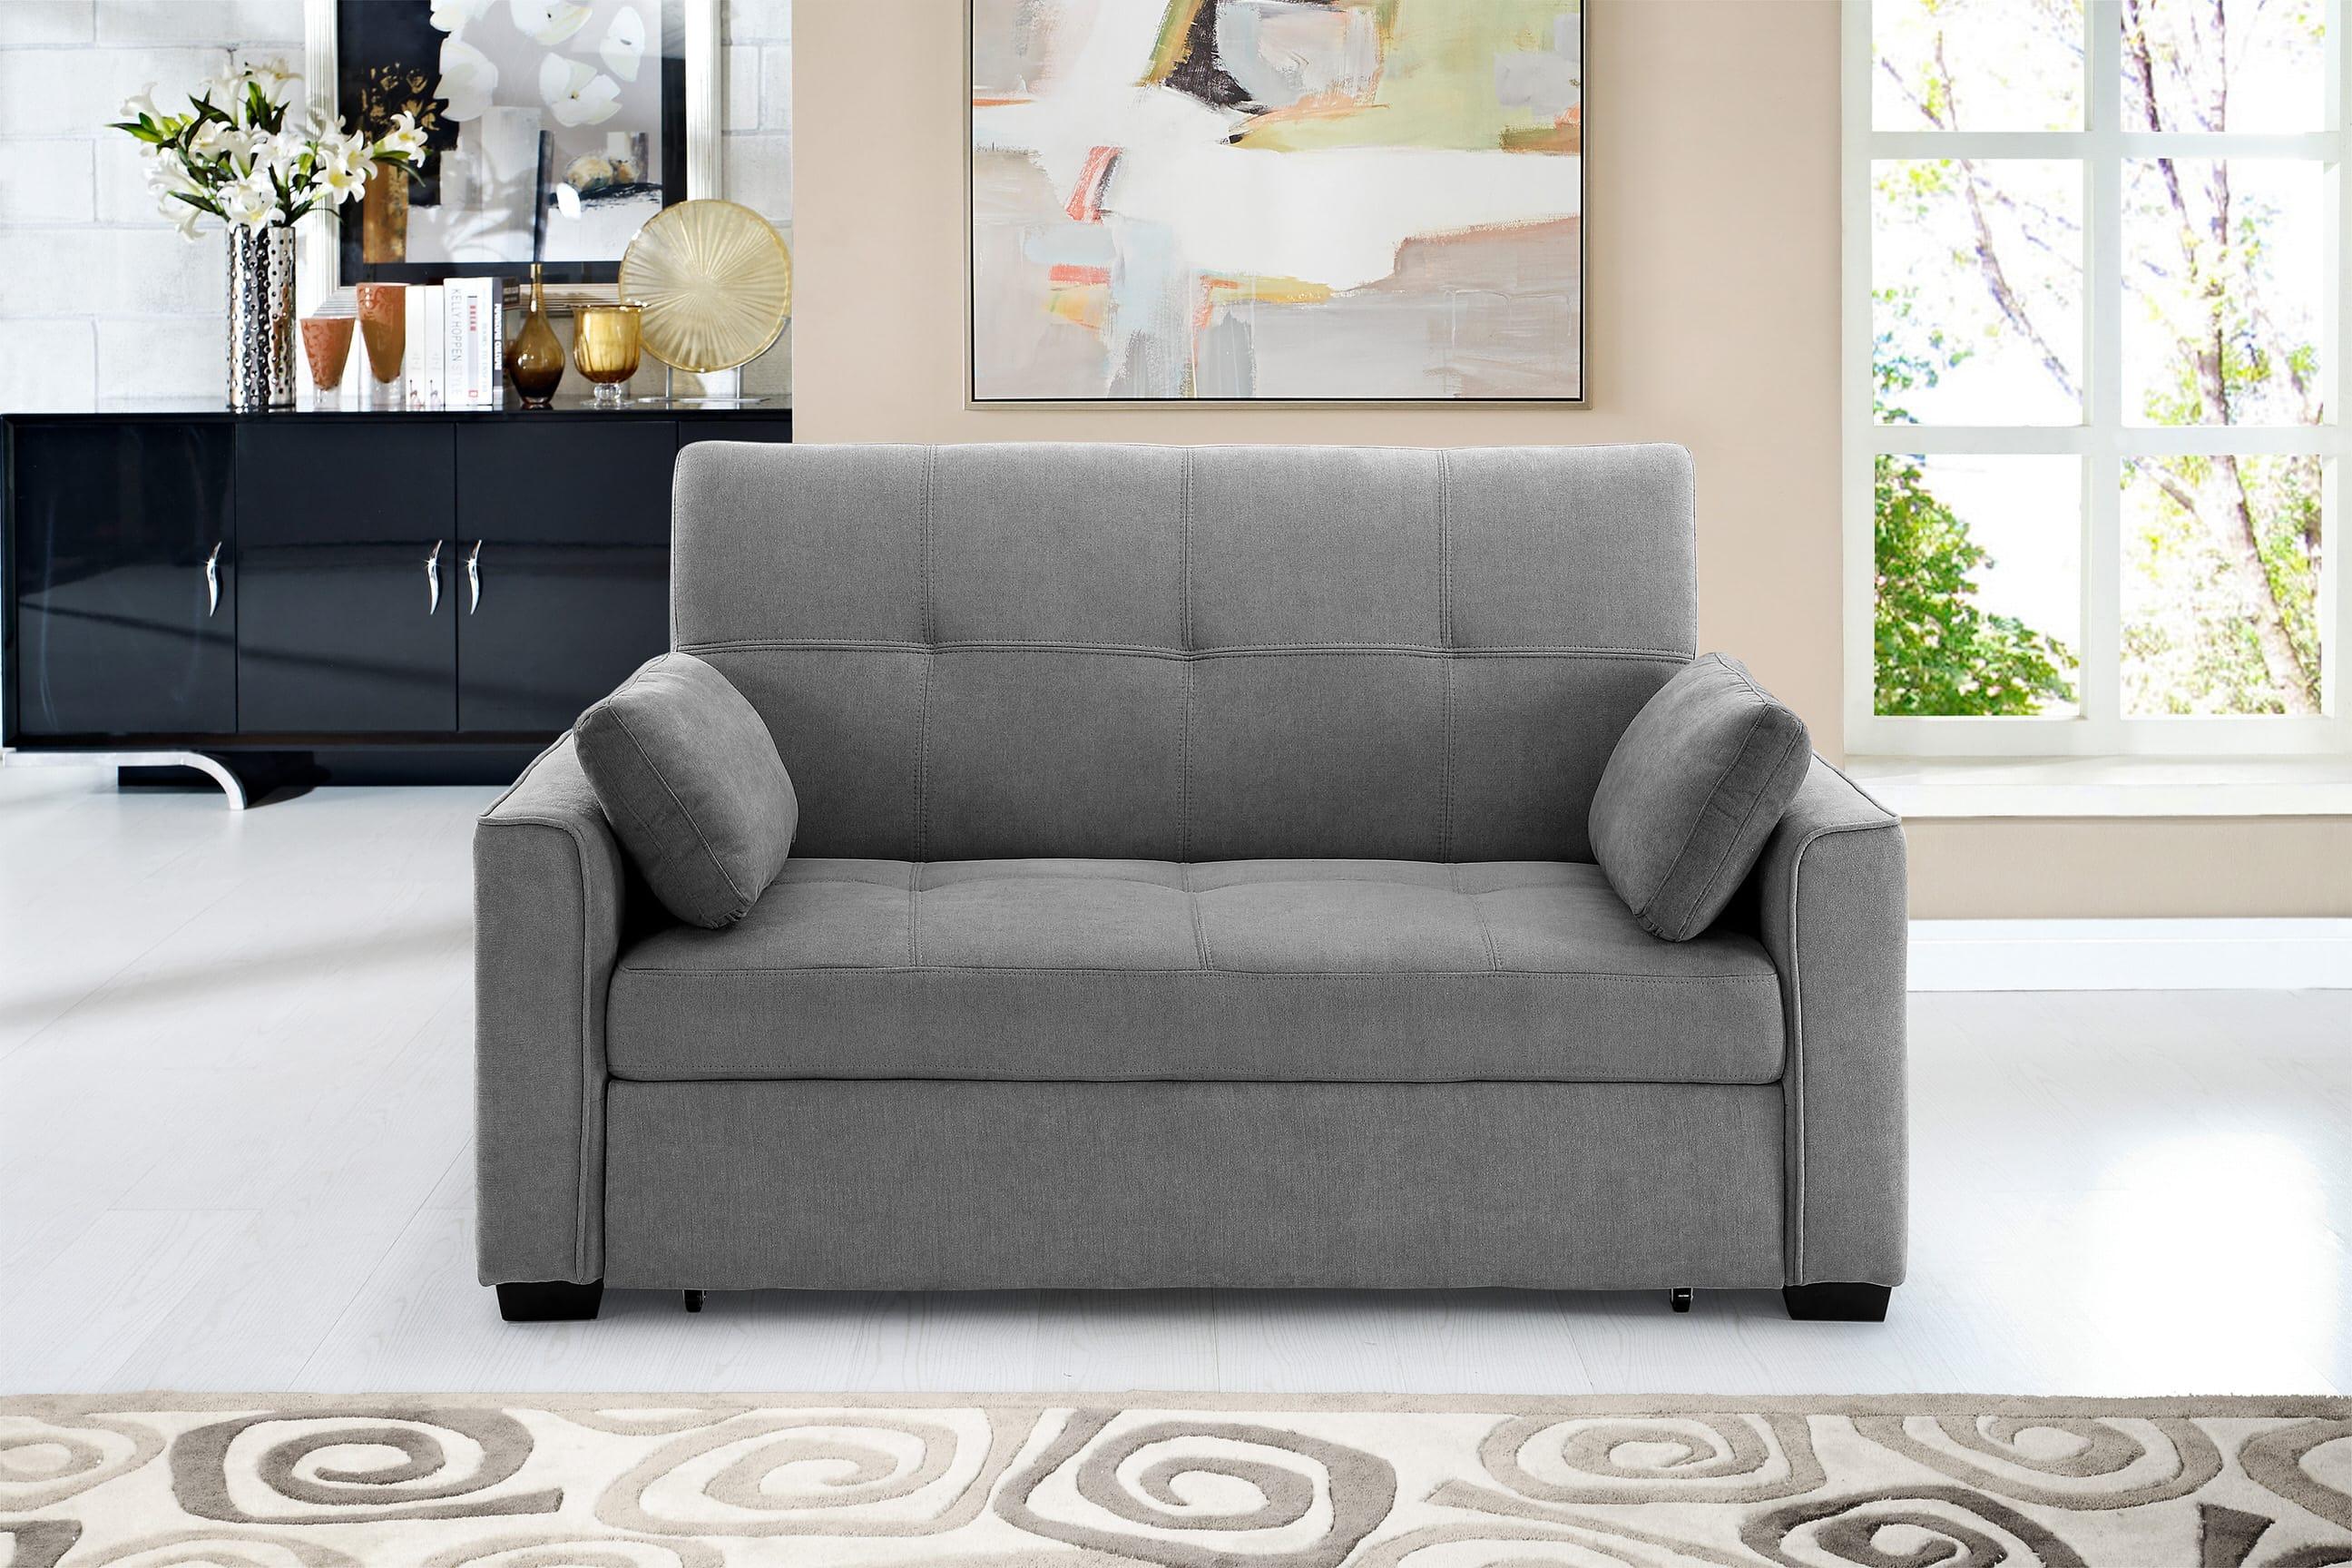 Nantucket Loveseat Full Size Sleeper Light Gray by Night&Day Furniture